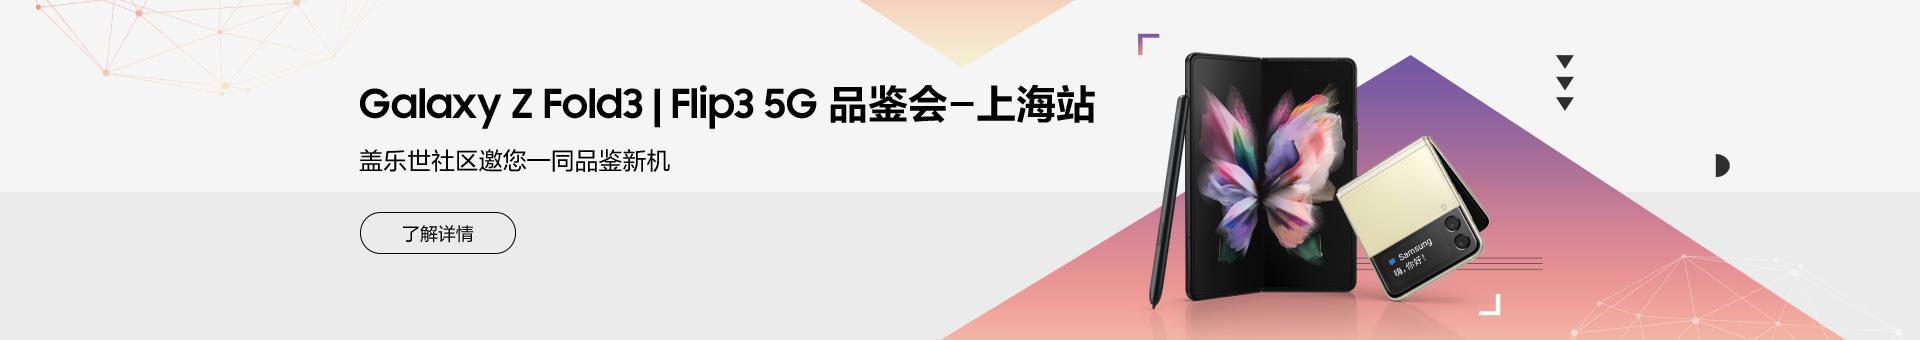 Galaxy Z Fold3 | Flip3 5G品鉴会-上海站,邀你一同品鉴新机